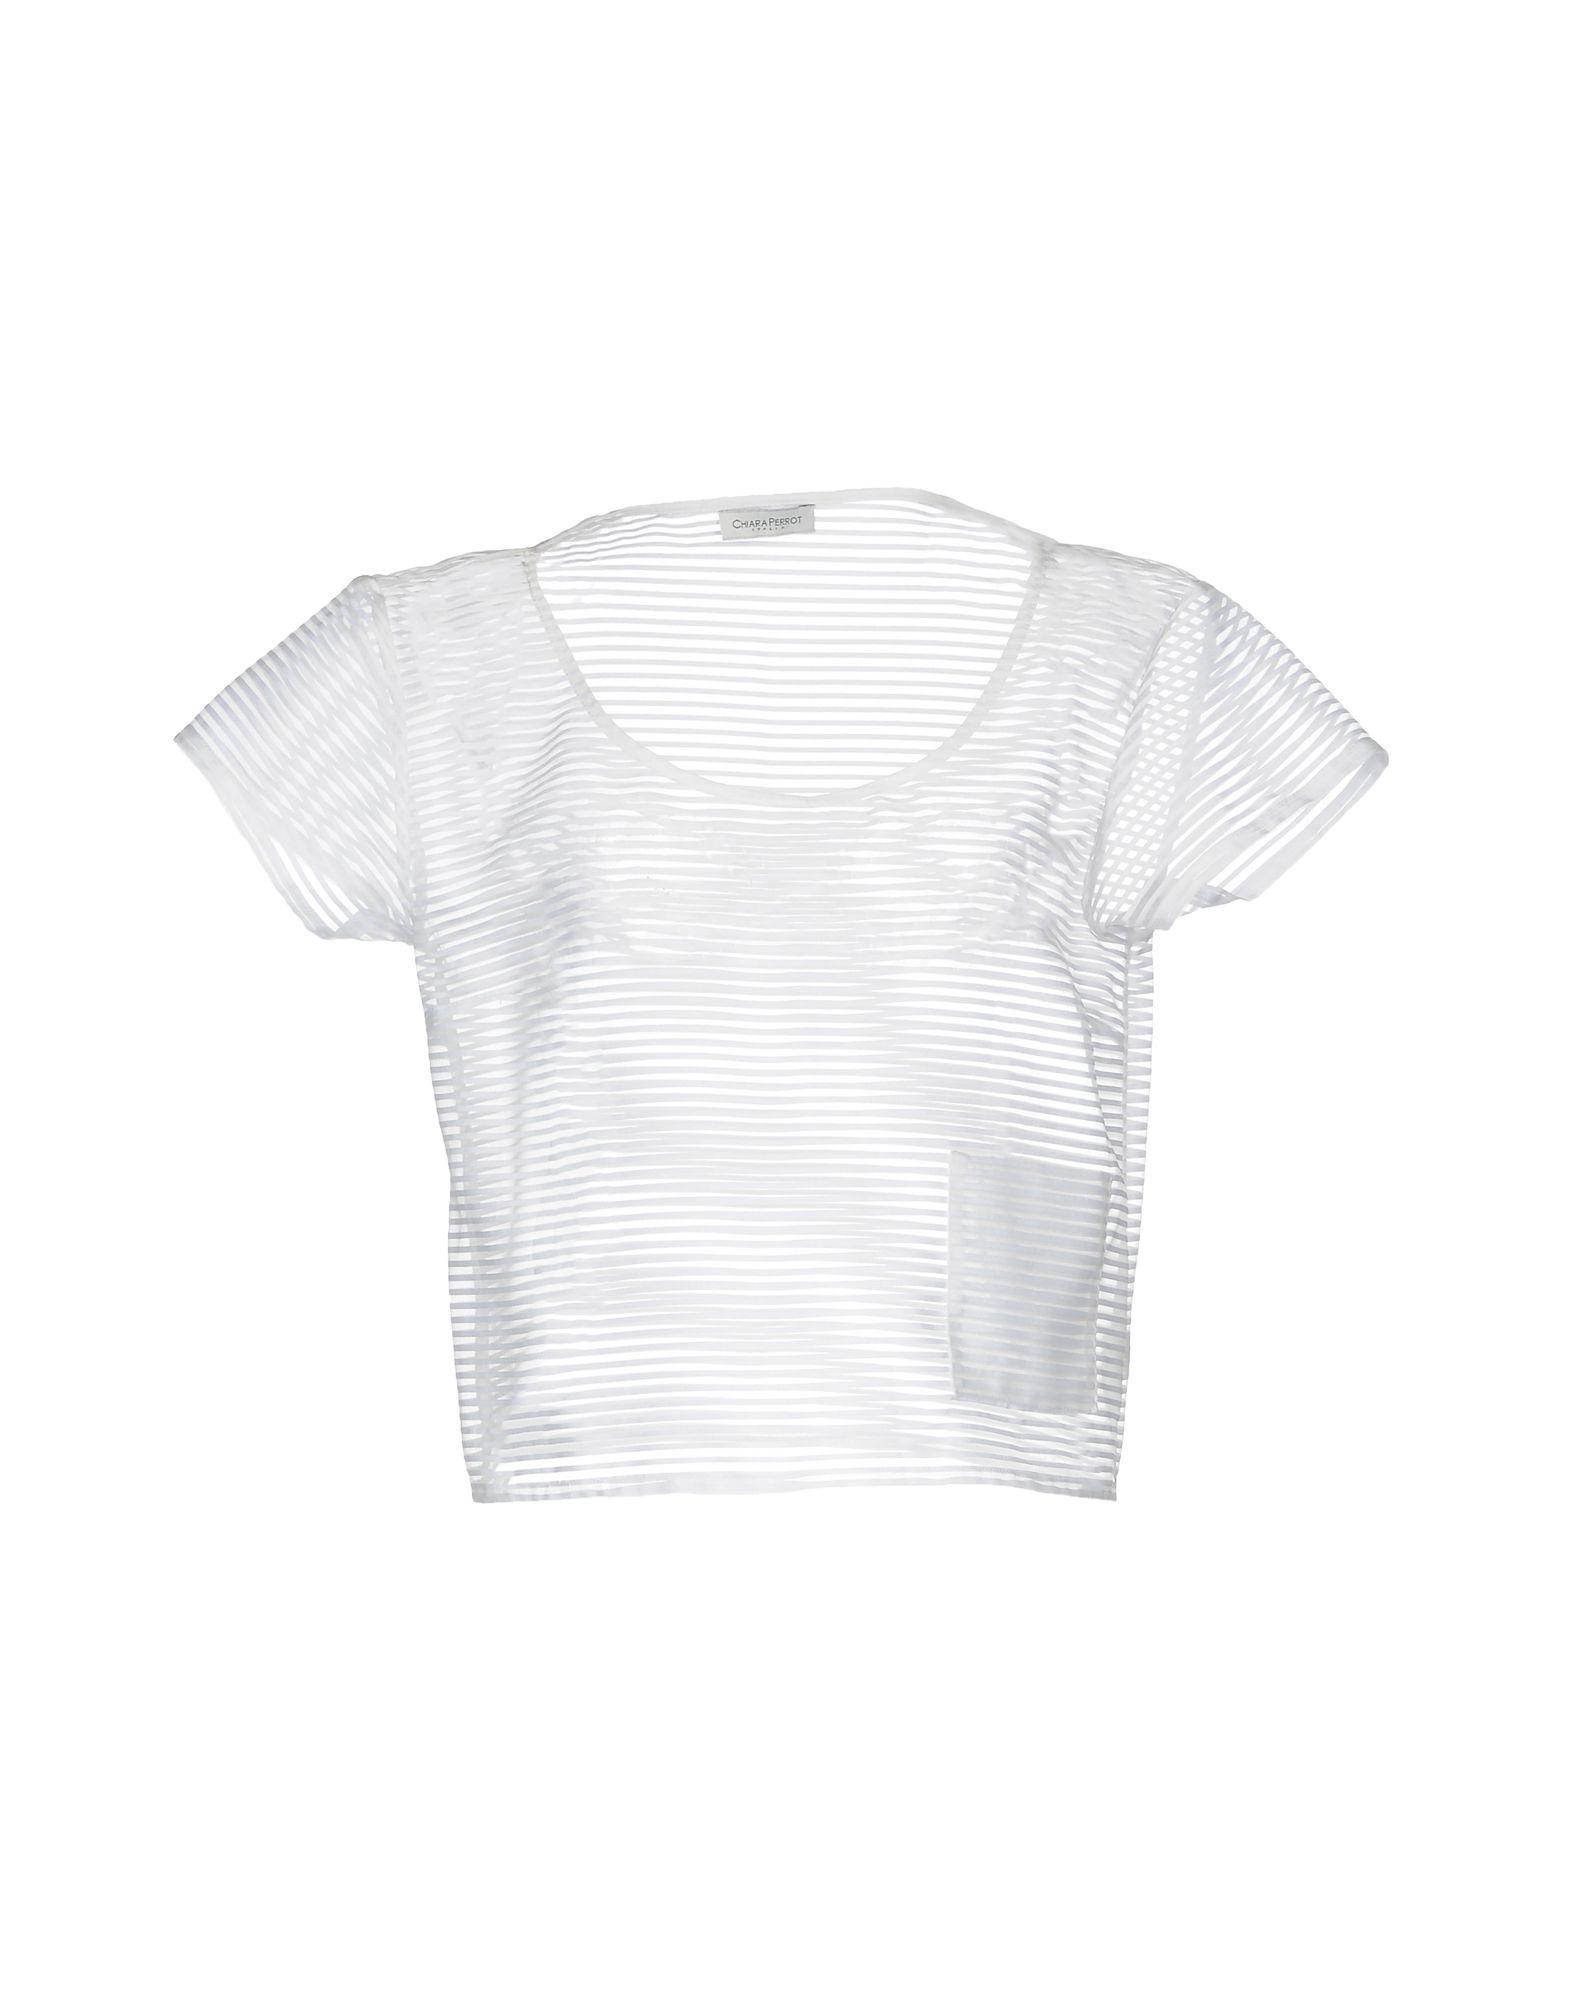 CHIARA PERROT Блузка блузка moda di chiara